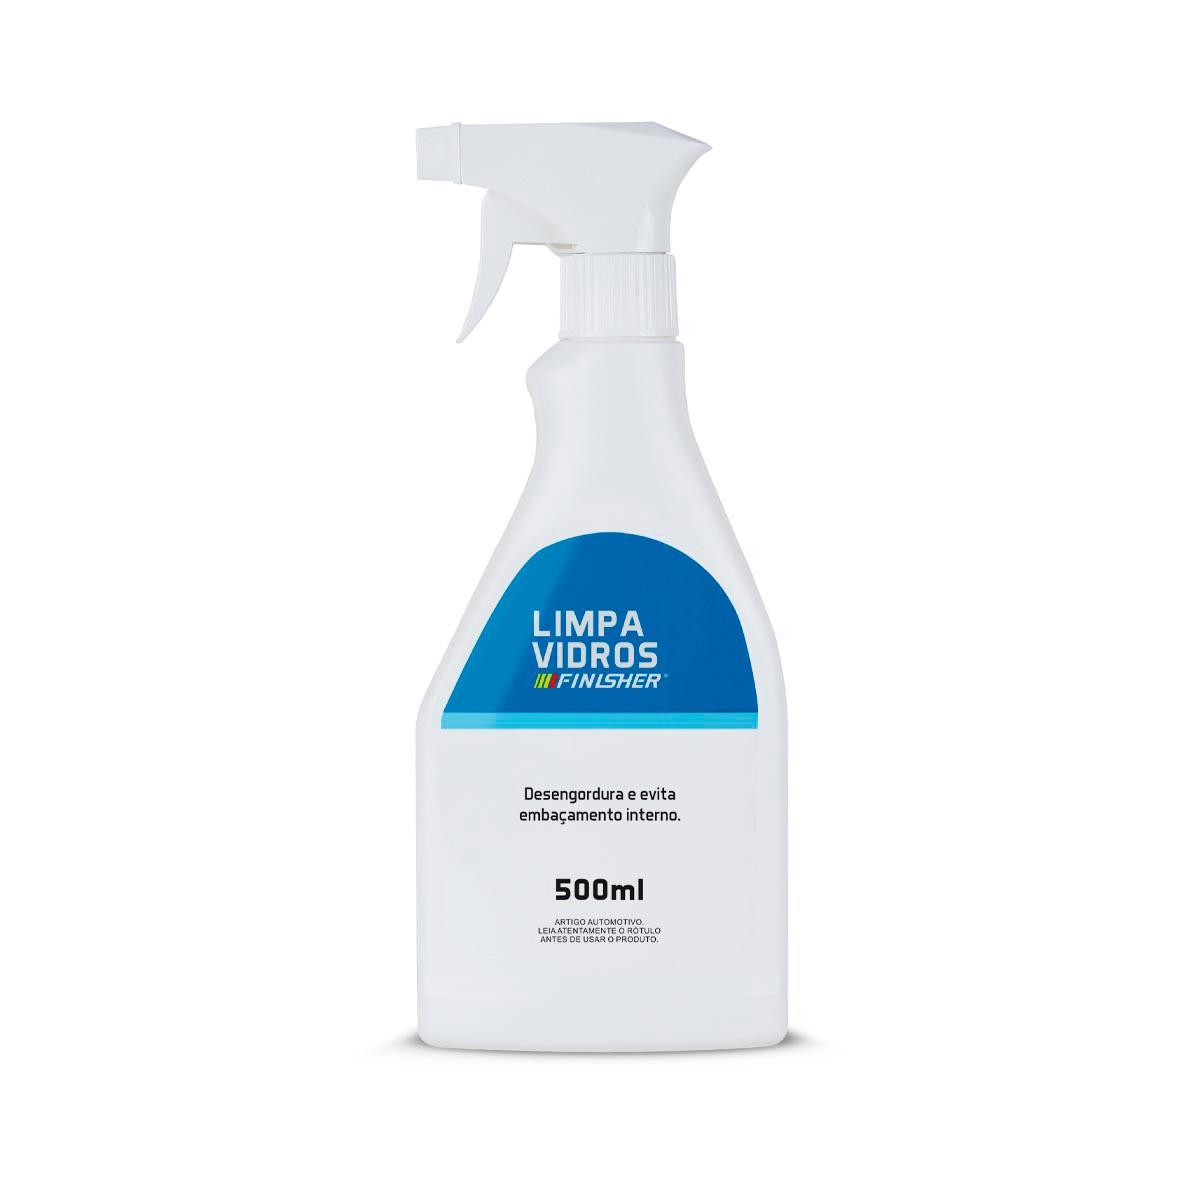 Limpa Vidros 500ml Spray - Finisher